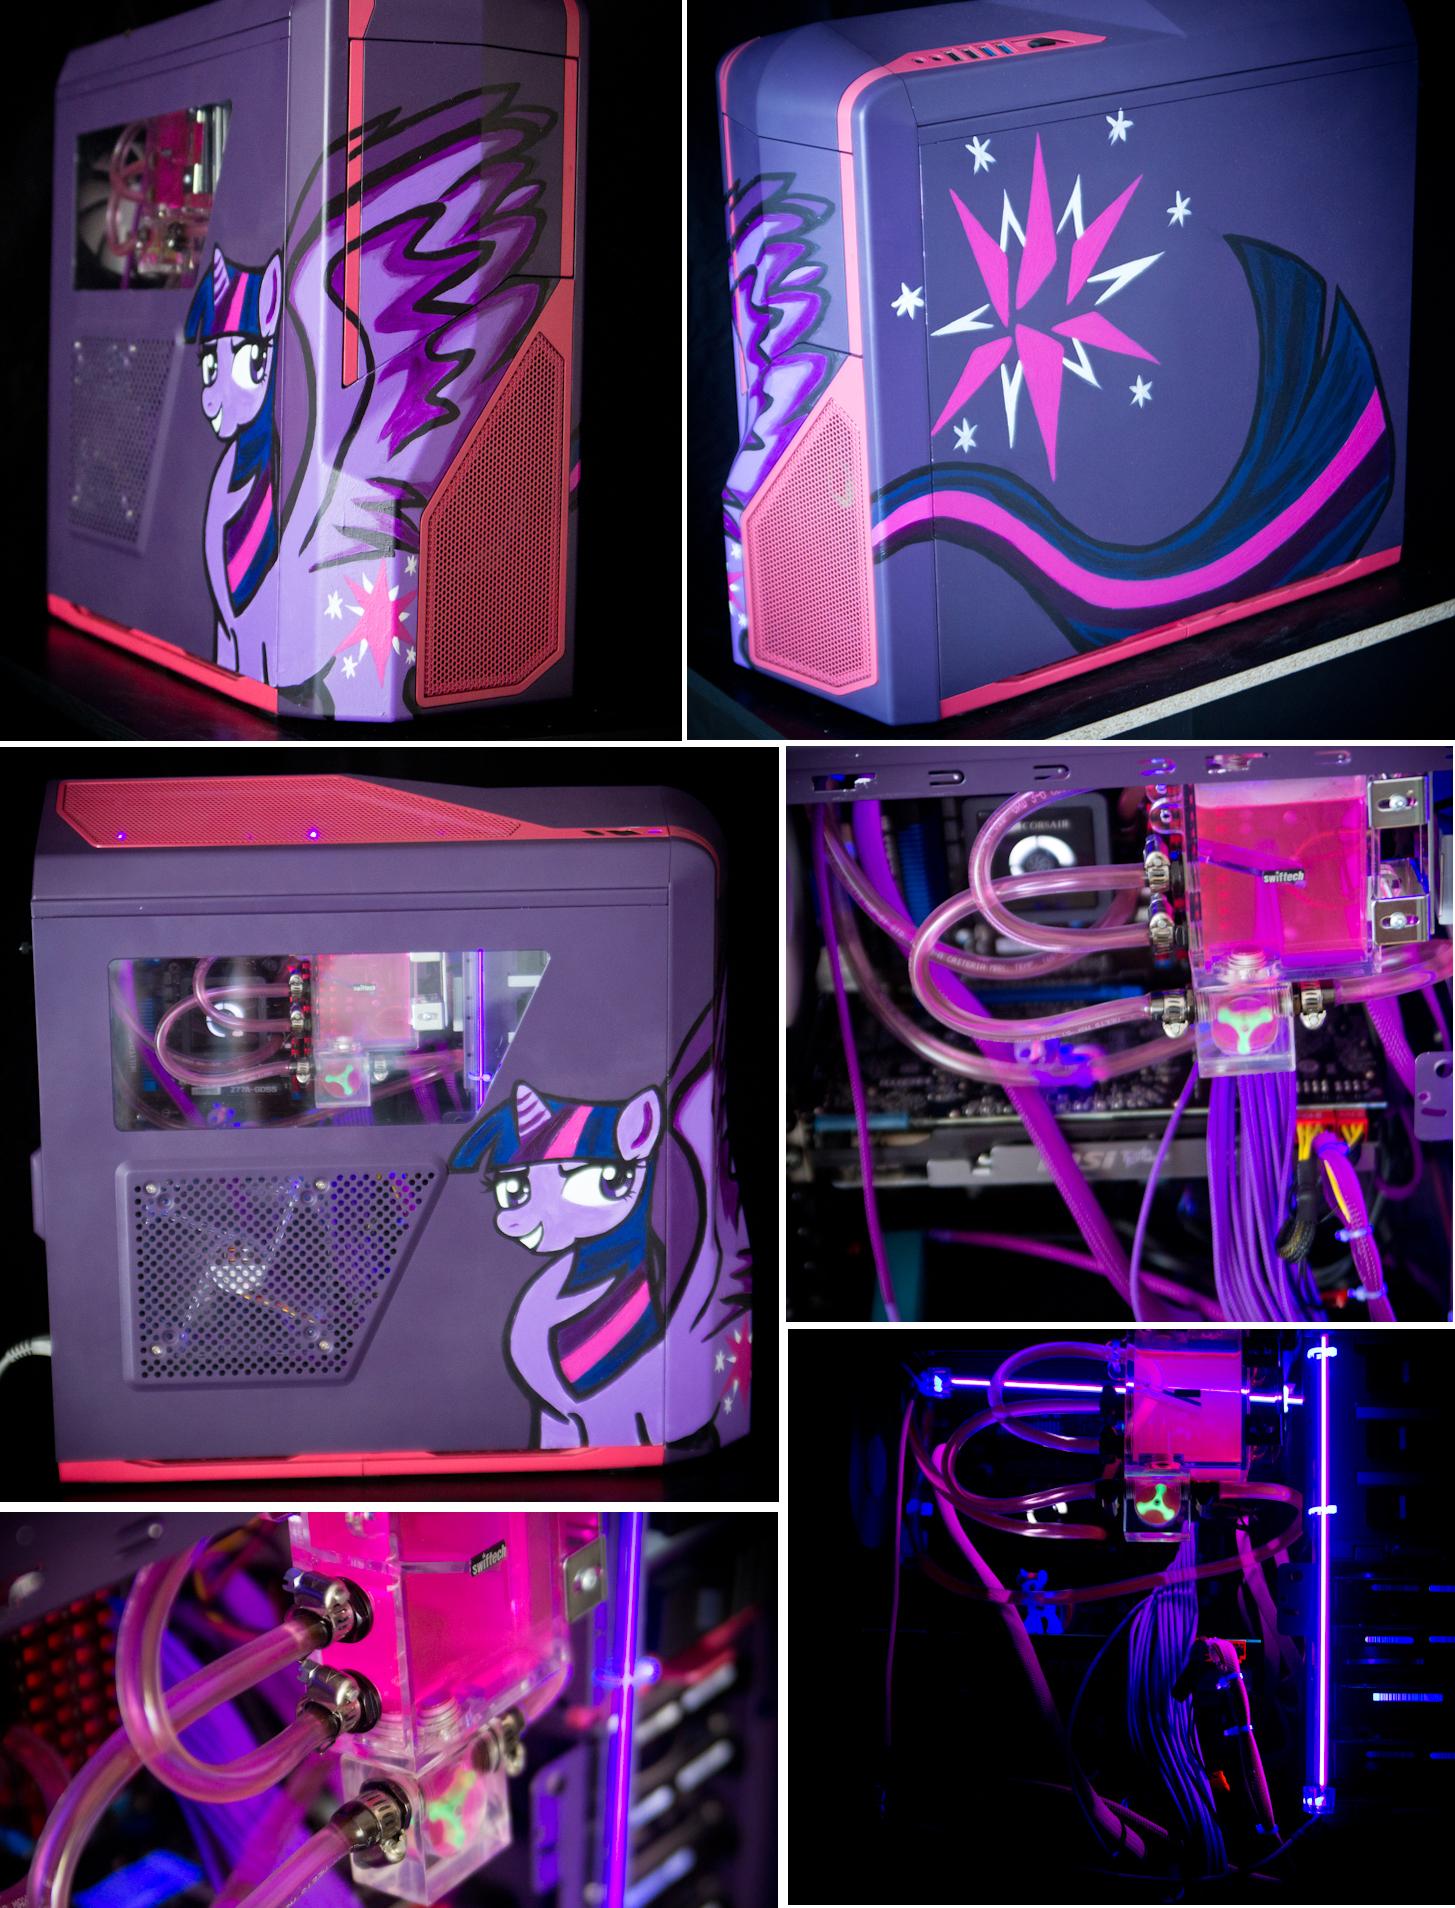 Twilight Sparkle Custom Liquid Cooled Gaming Pc By Tao